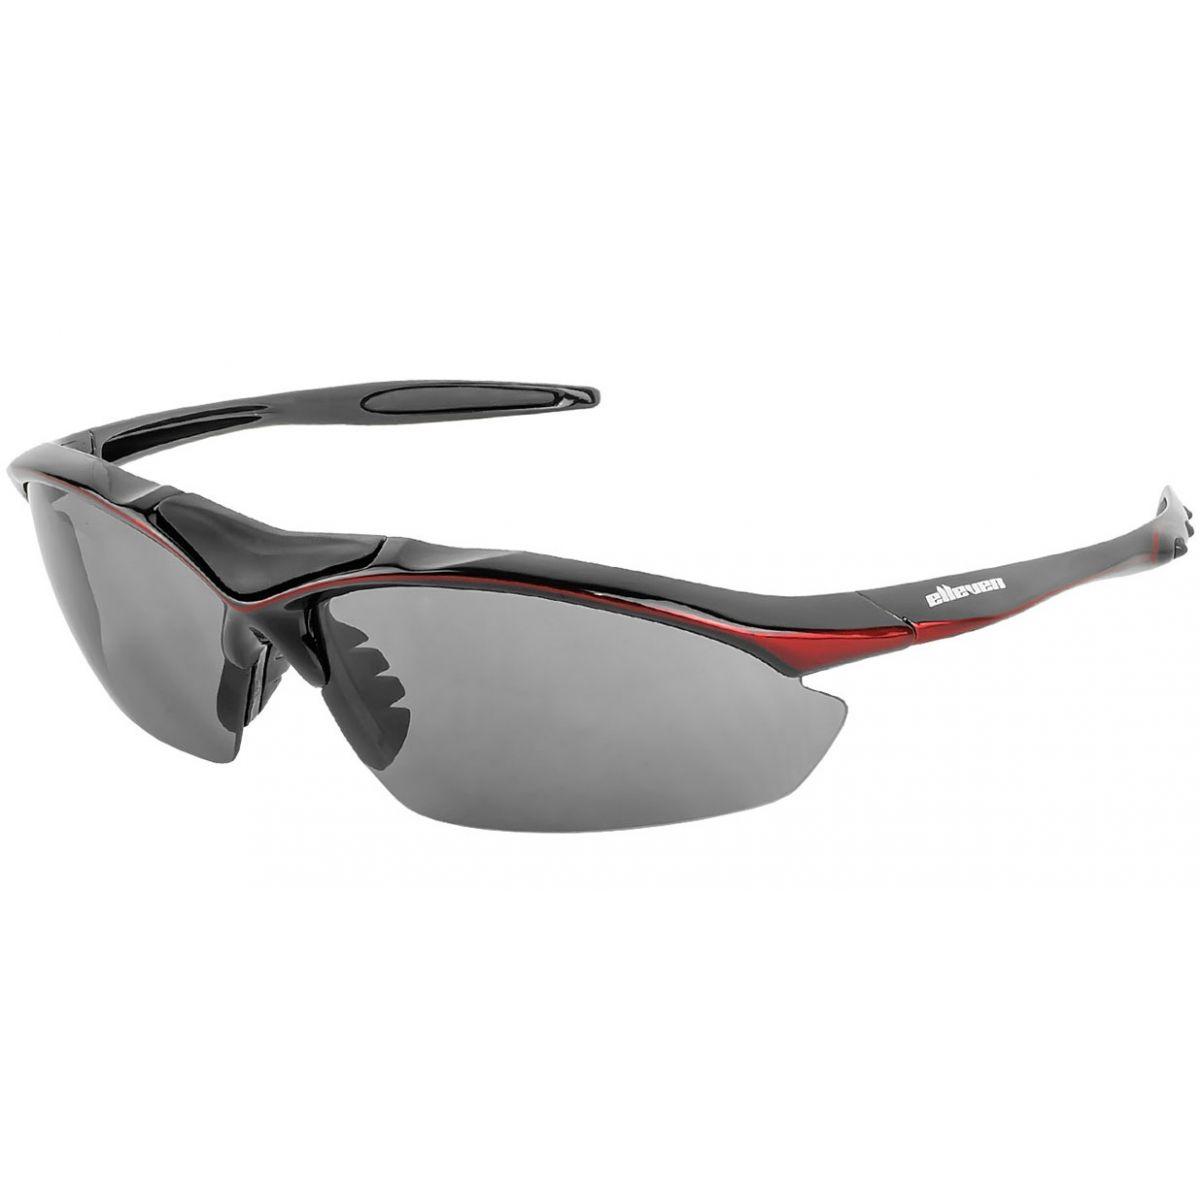 Óculos Elleven Spider - Preto c/ Vermelho